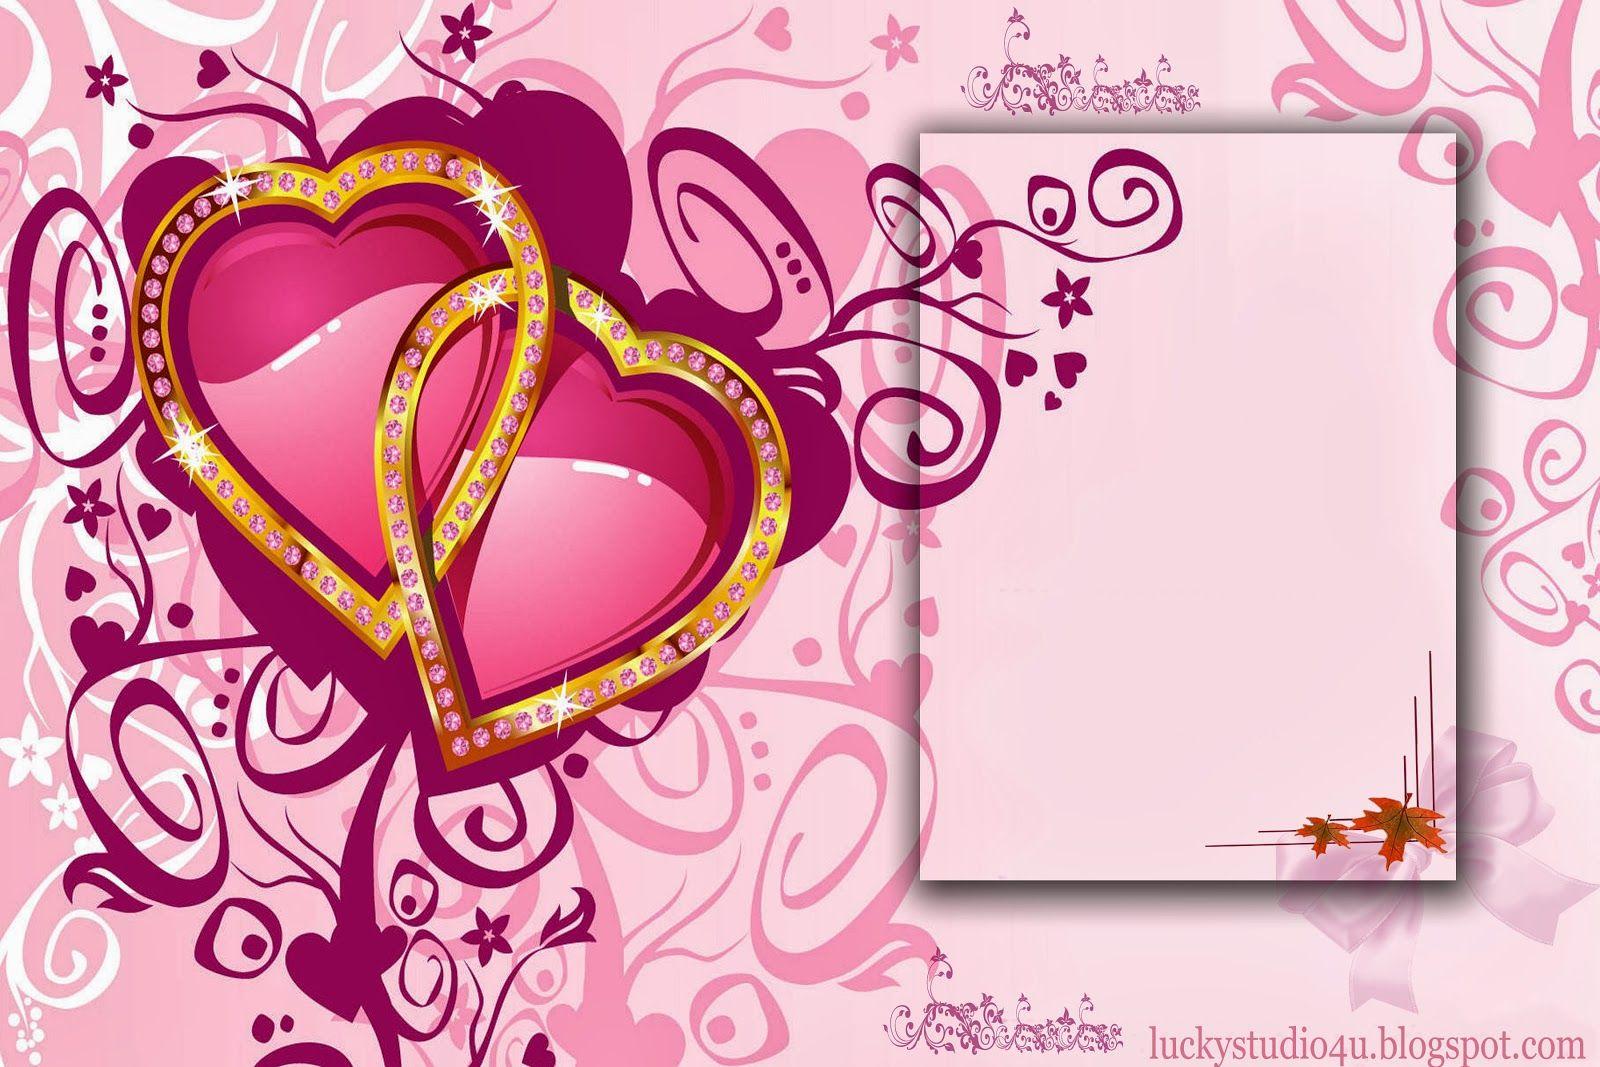 Digital Wedding Album Design Psd File Free Download Lucky Studio 4u Wedding Album Design Album Design Wedding Album